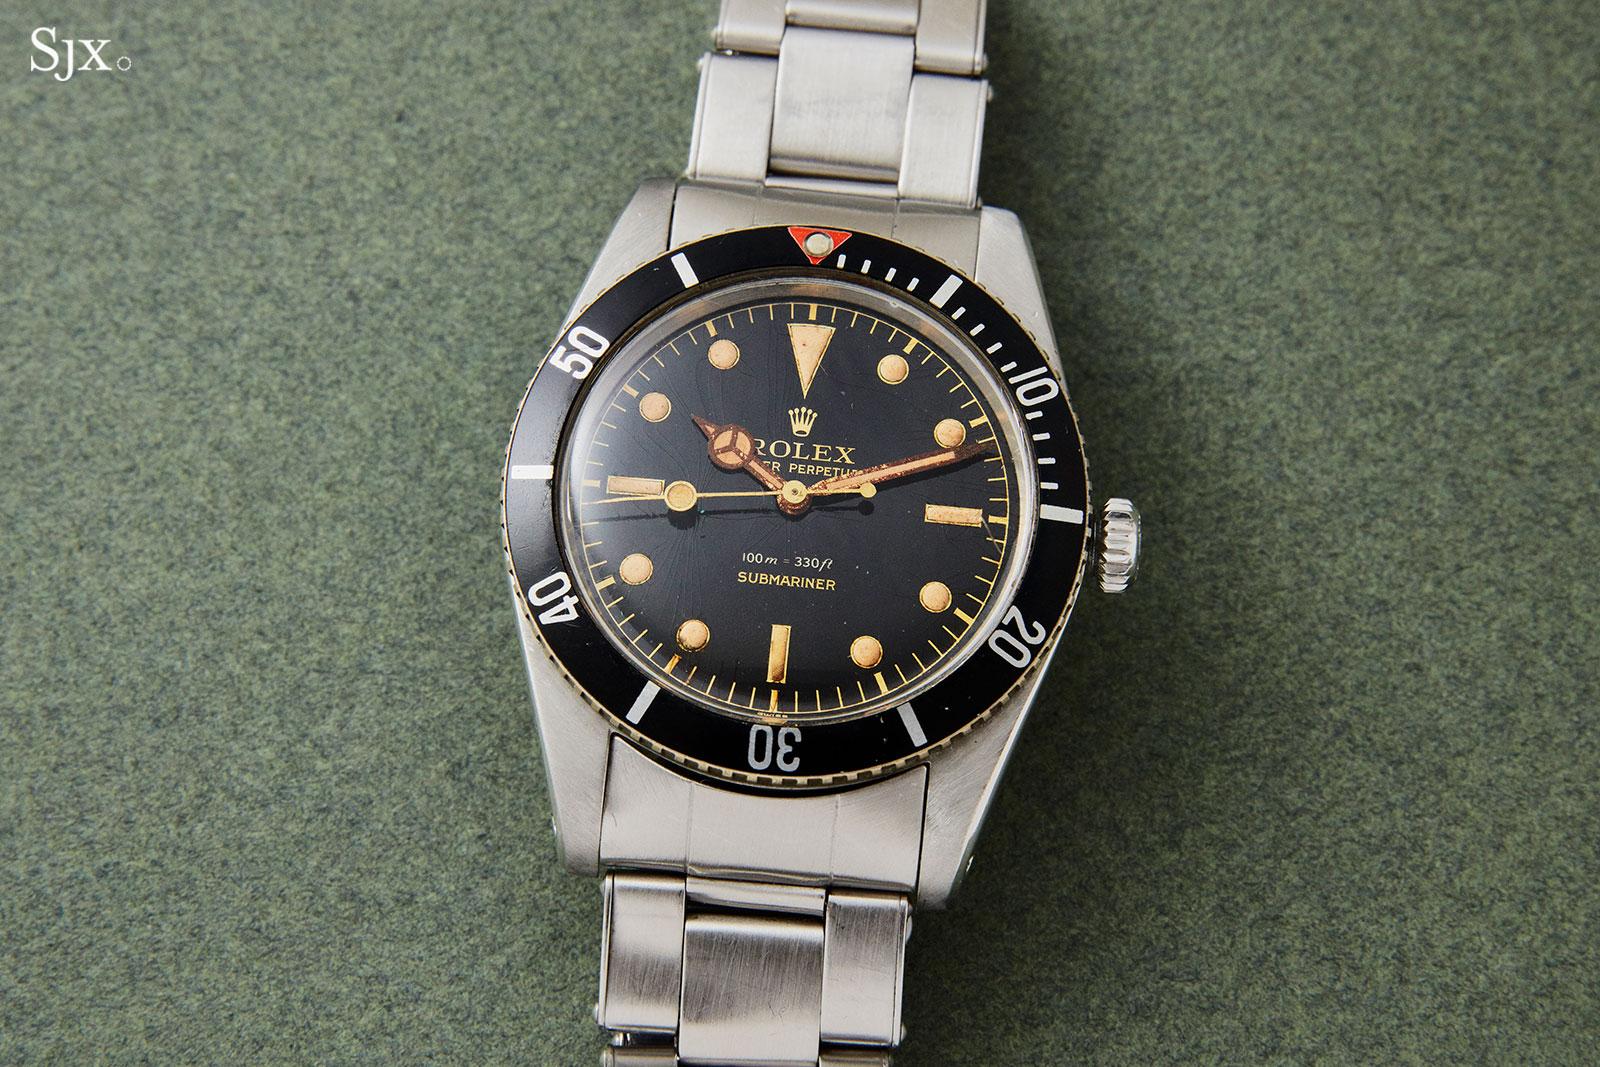 Rolex Submariner 6536 small crown james bond 2